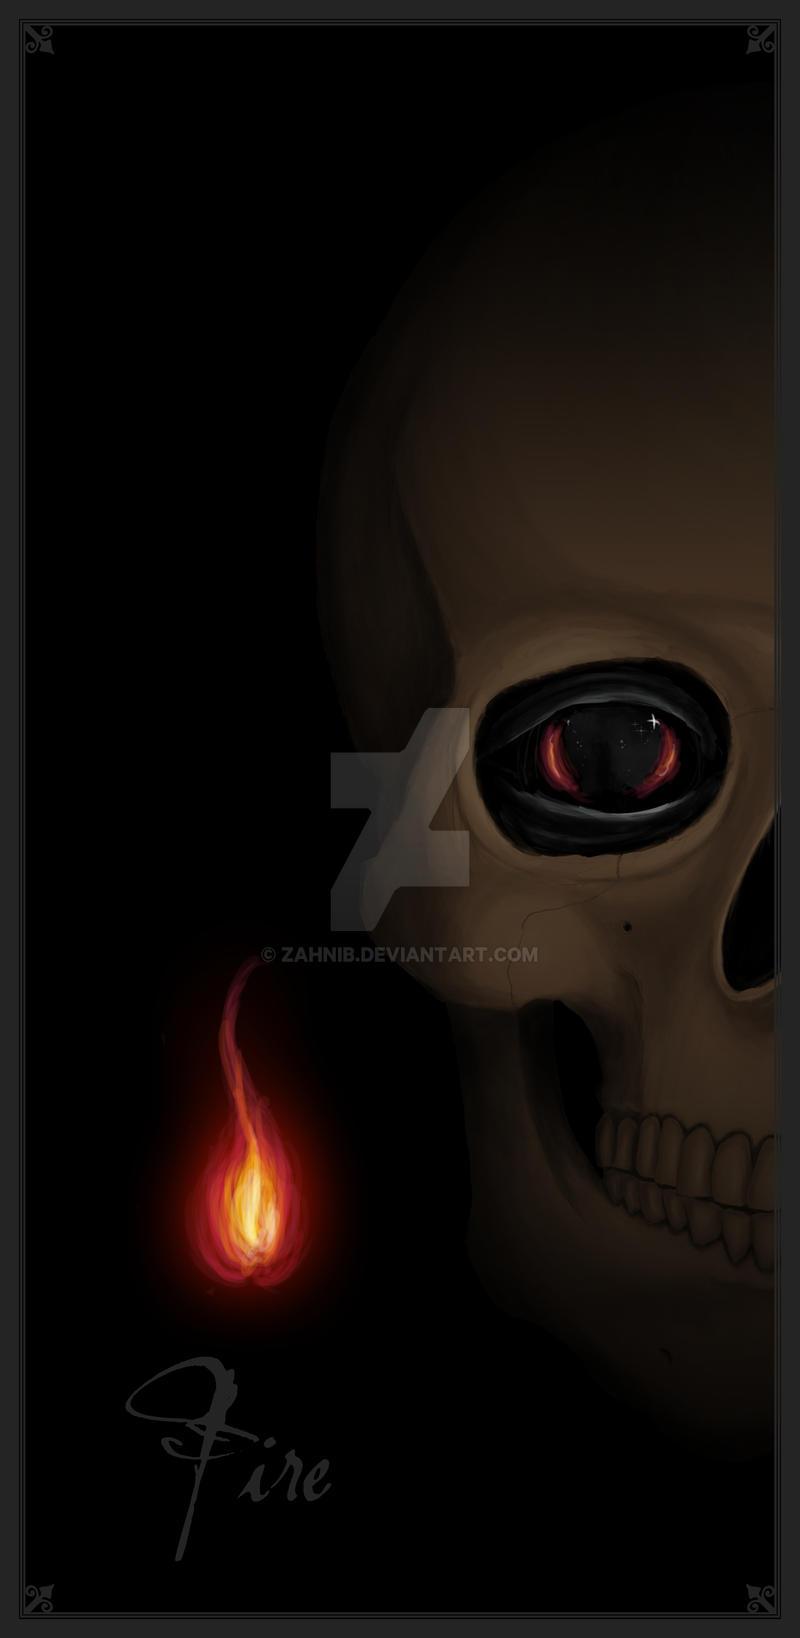 Fire by zahnib